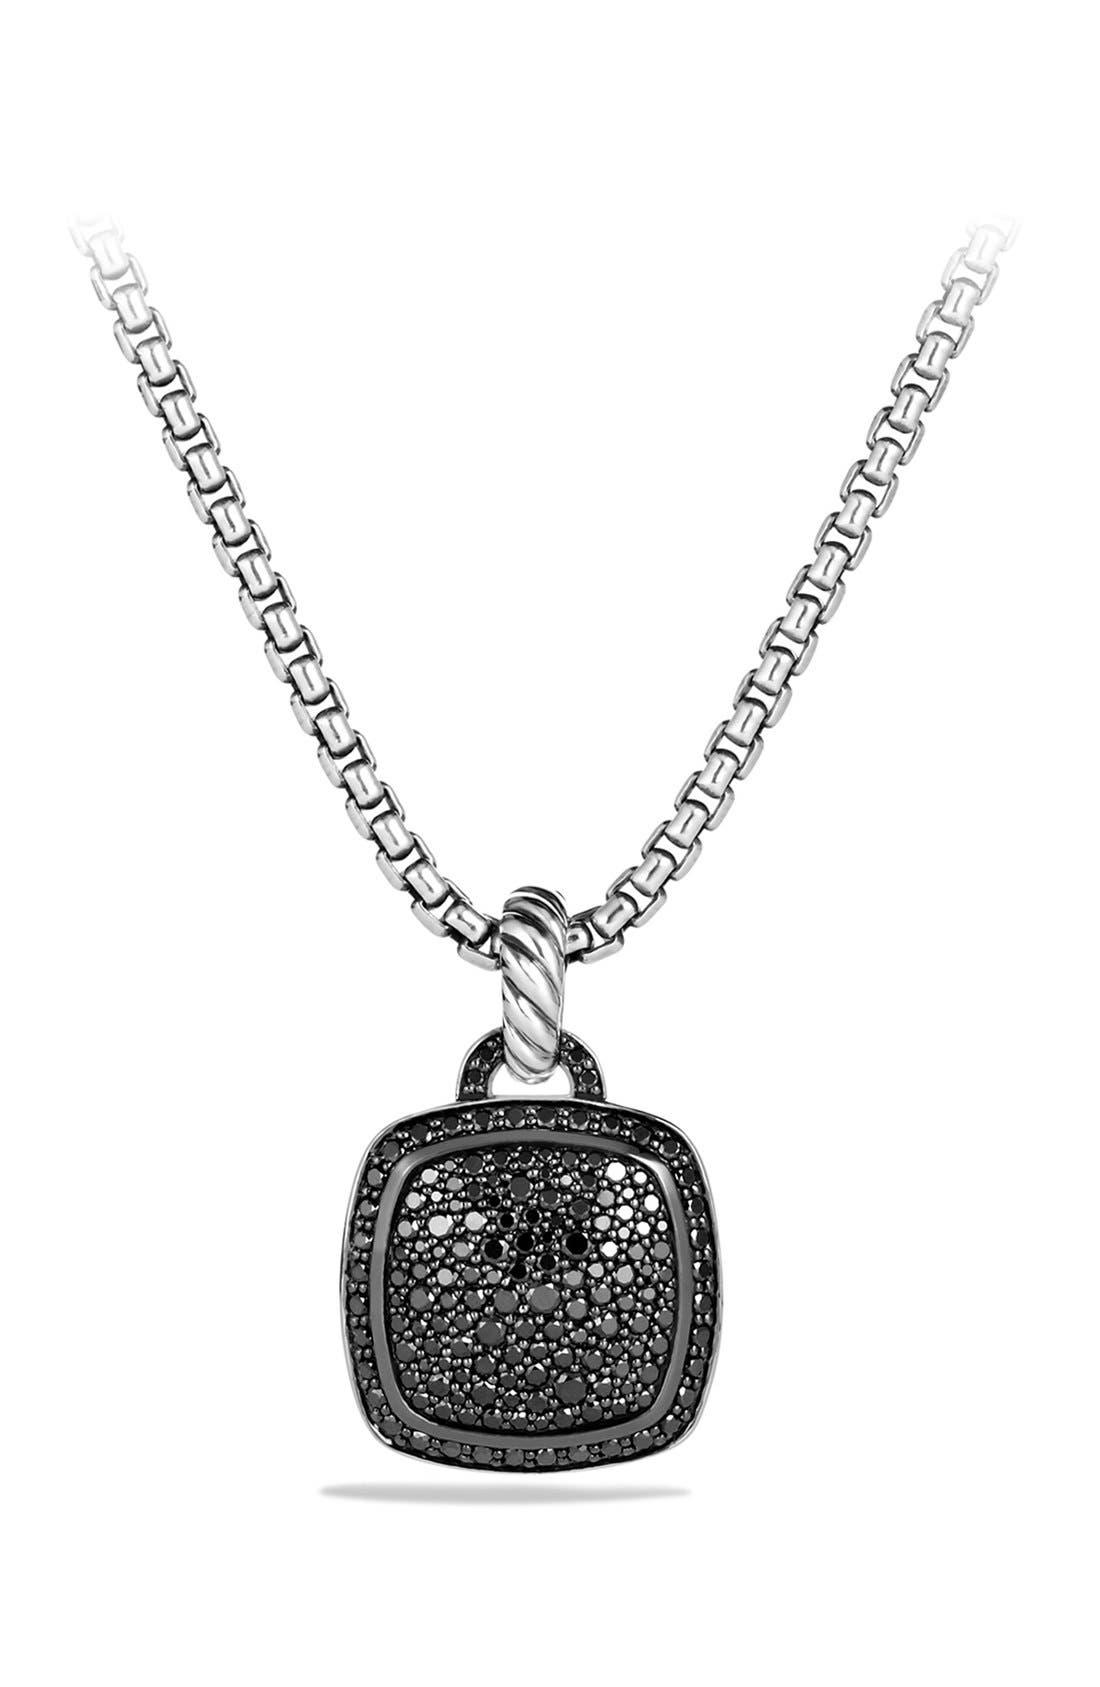 David Yurman 'Albion' Pendant with Diamonds